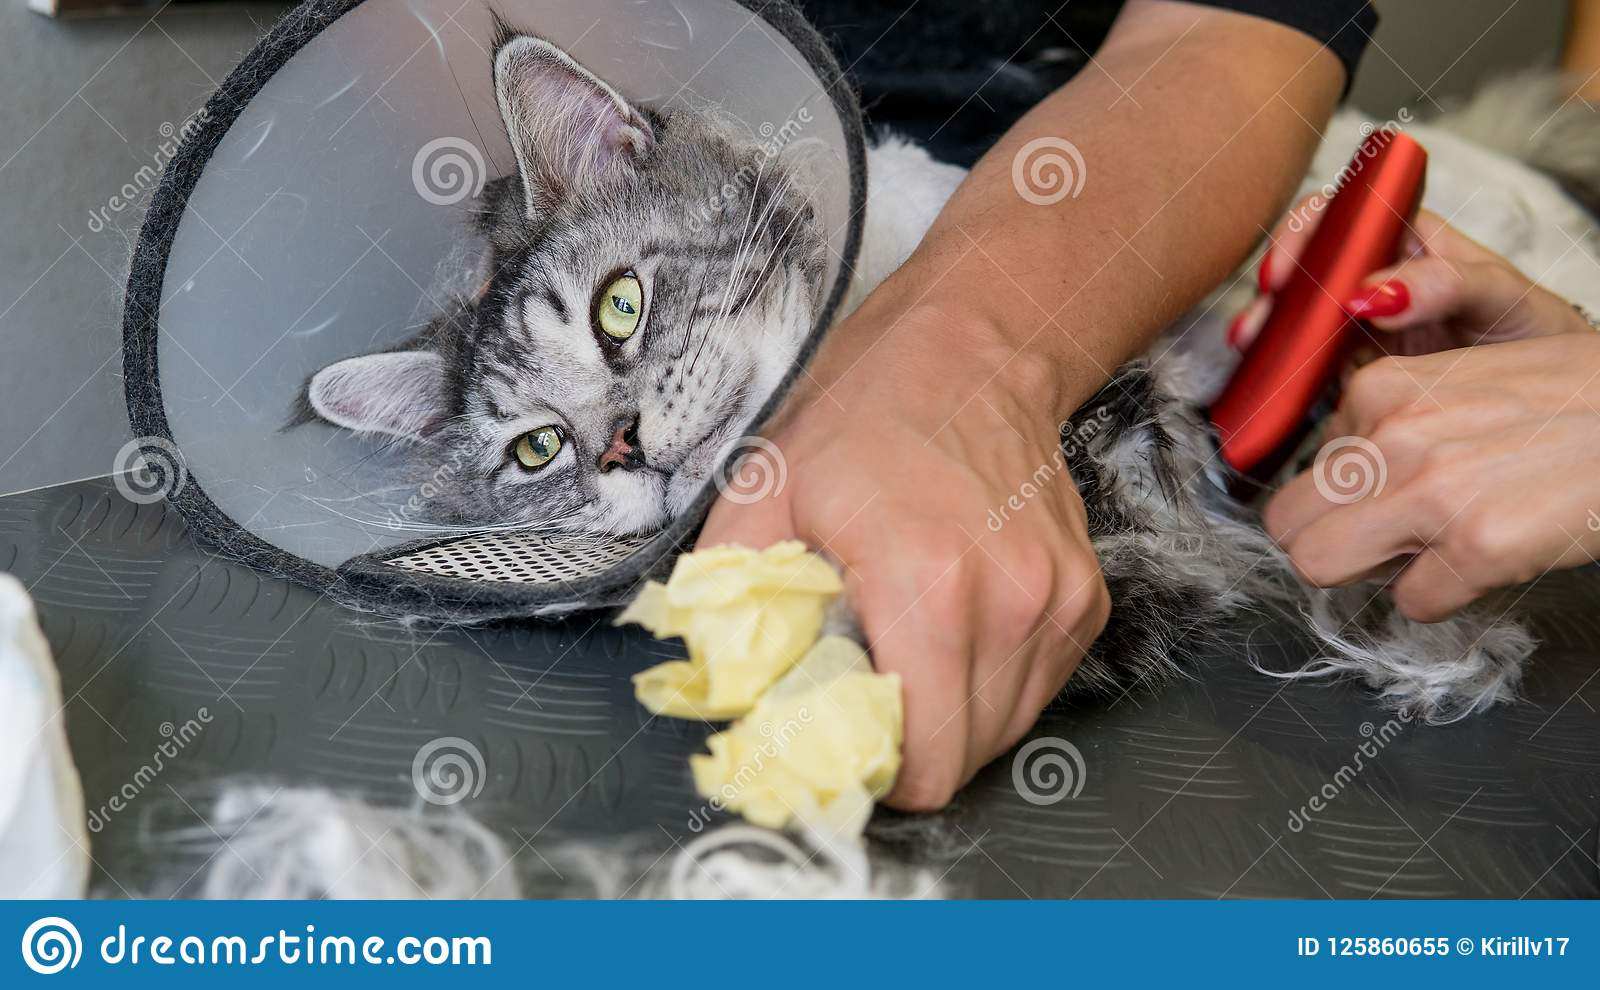 ProfessionellMaine Coon Cat Grooming närbild